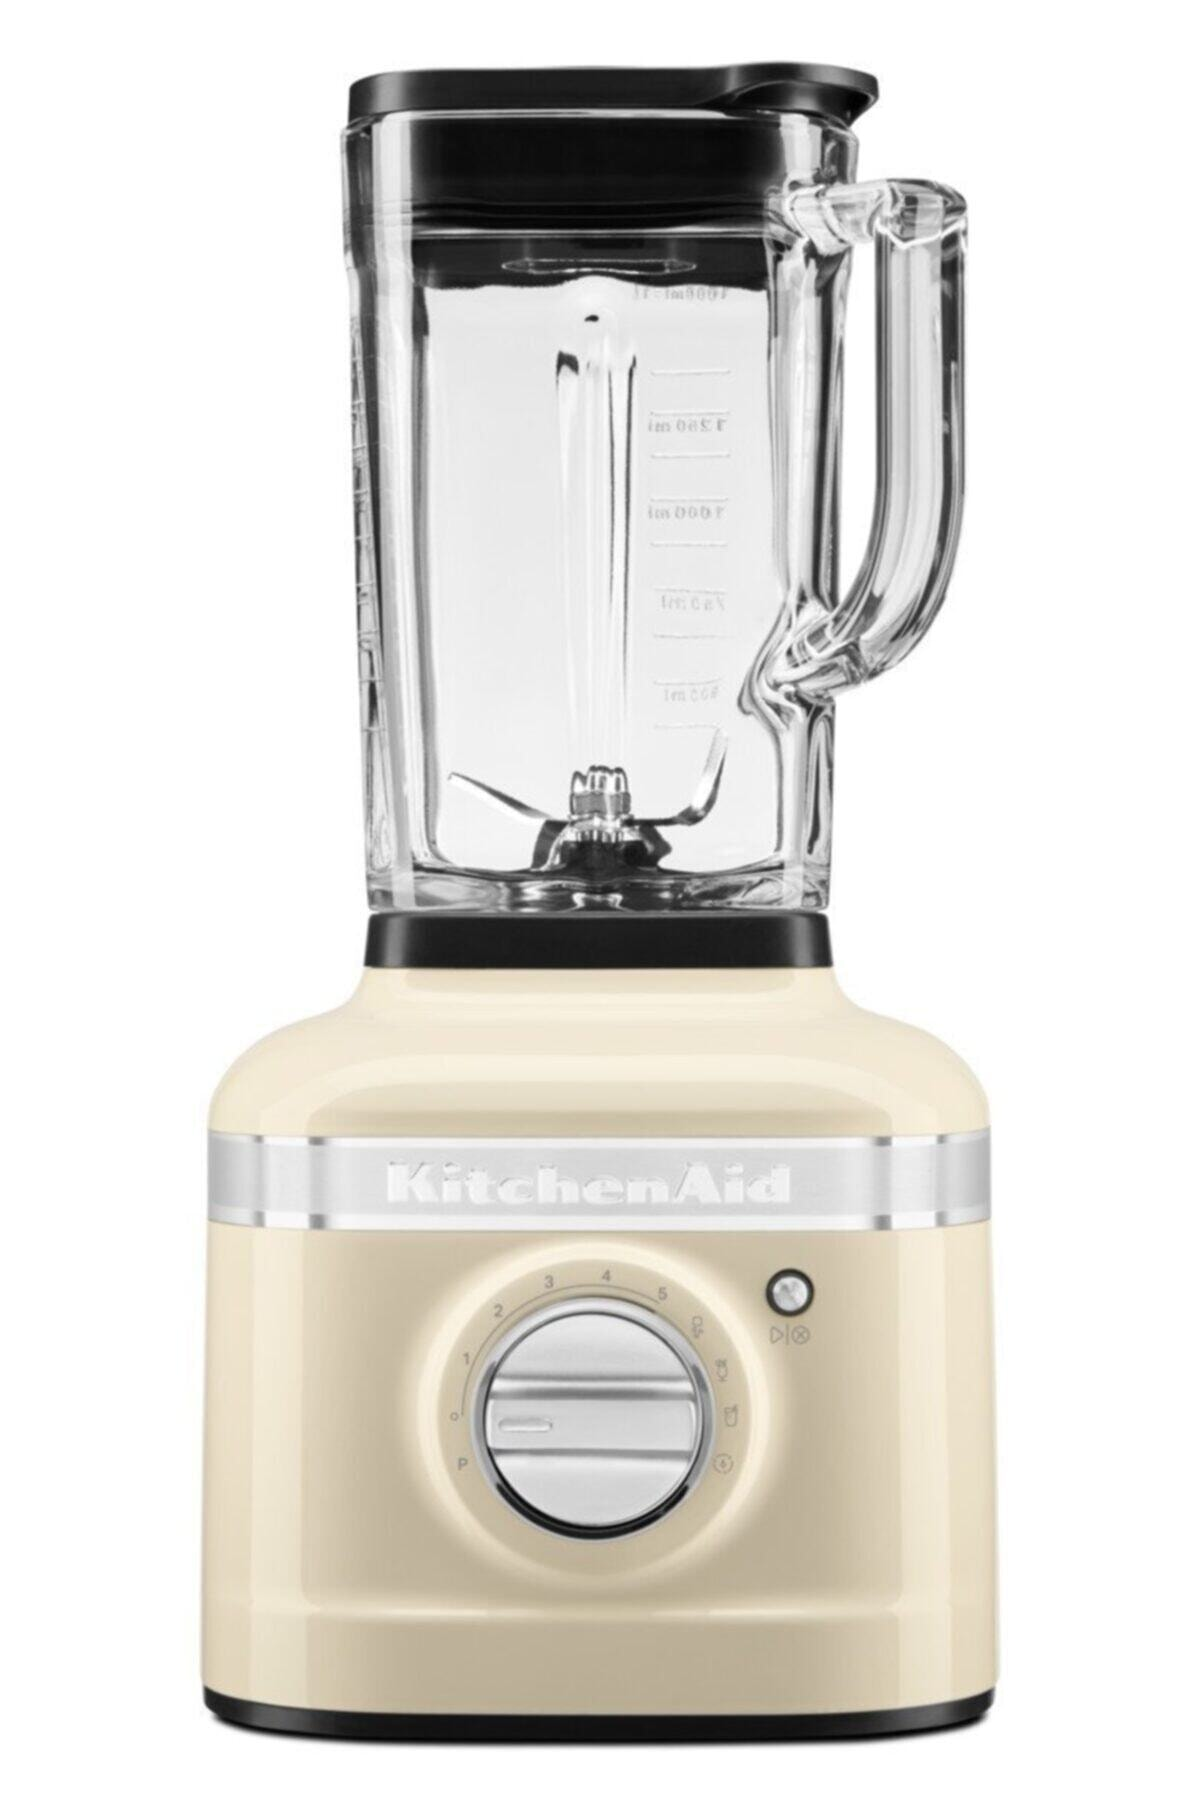 Kitchenaid K400 5ksb4026 Almond Cream Artisan Blender 1